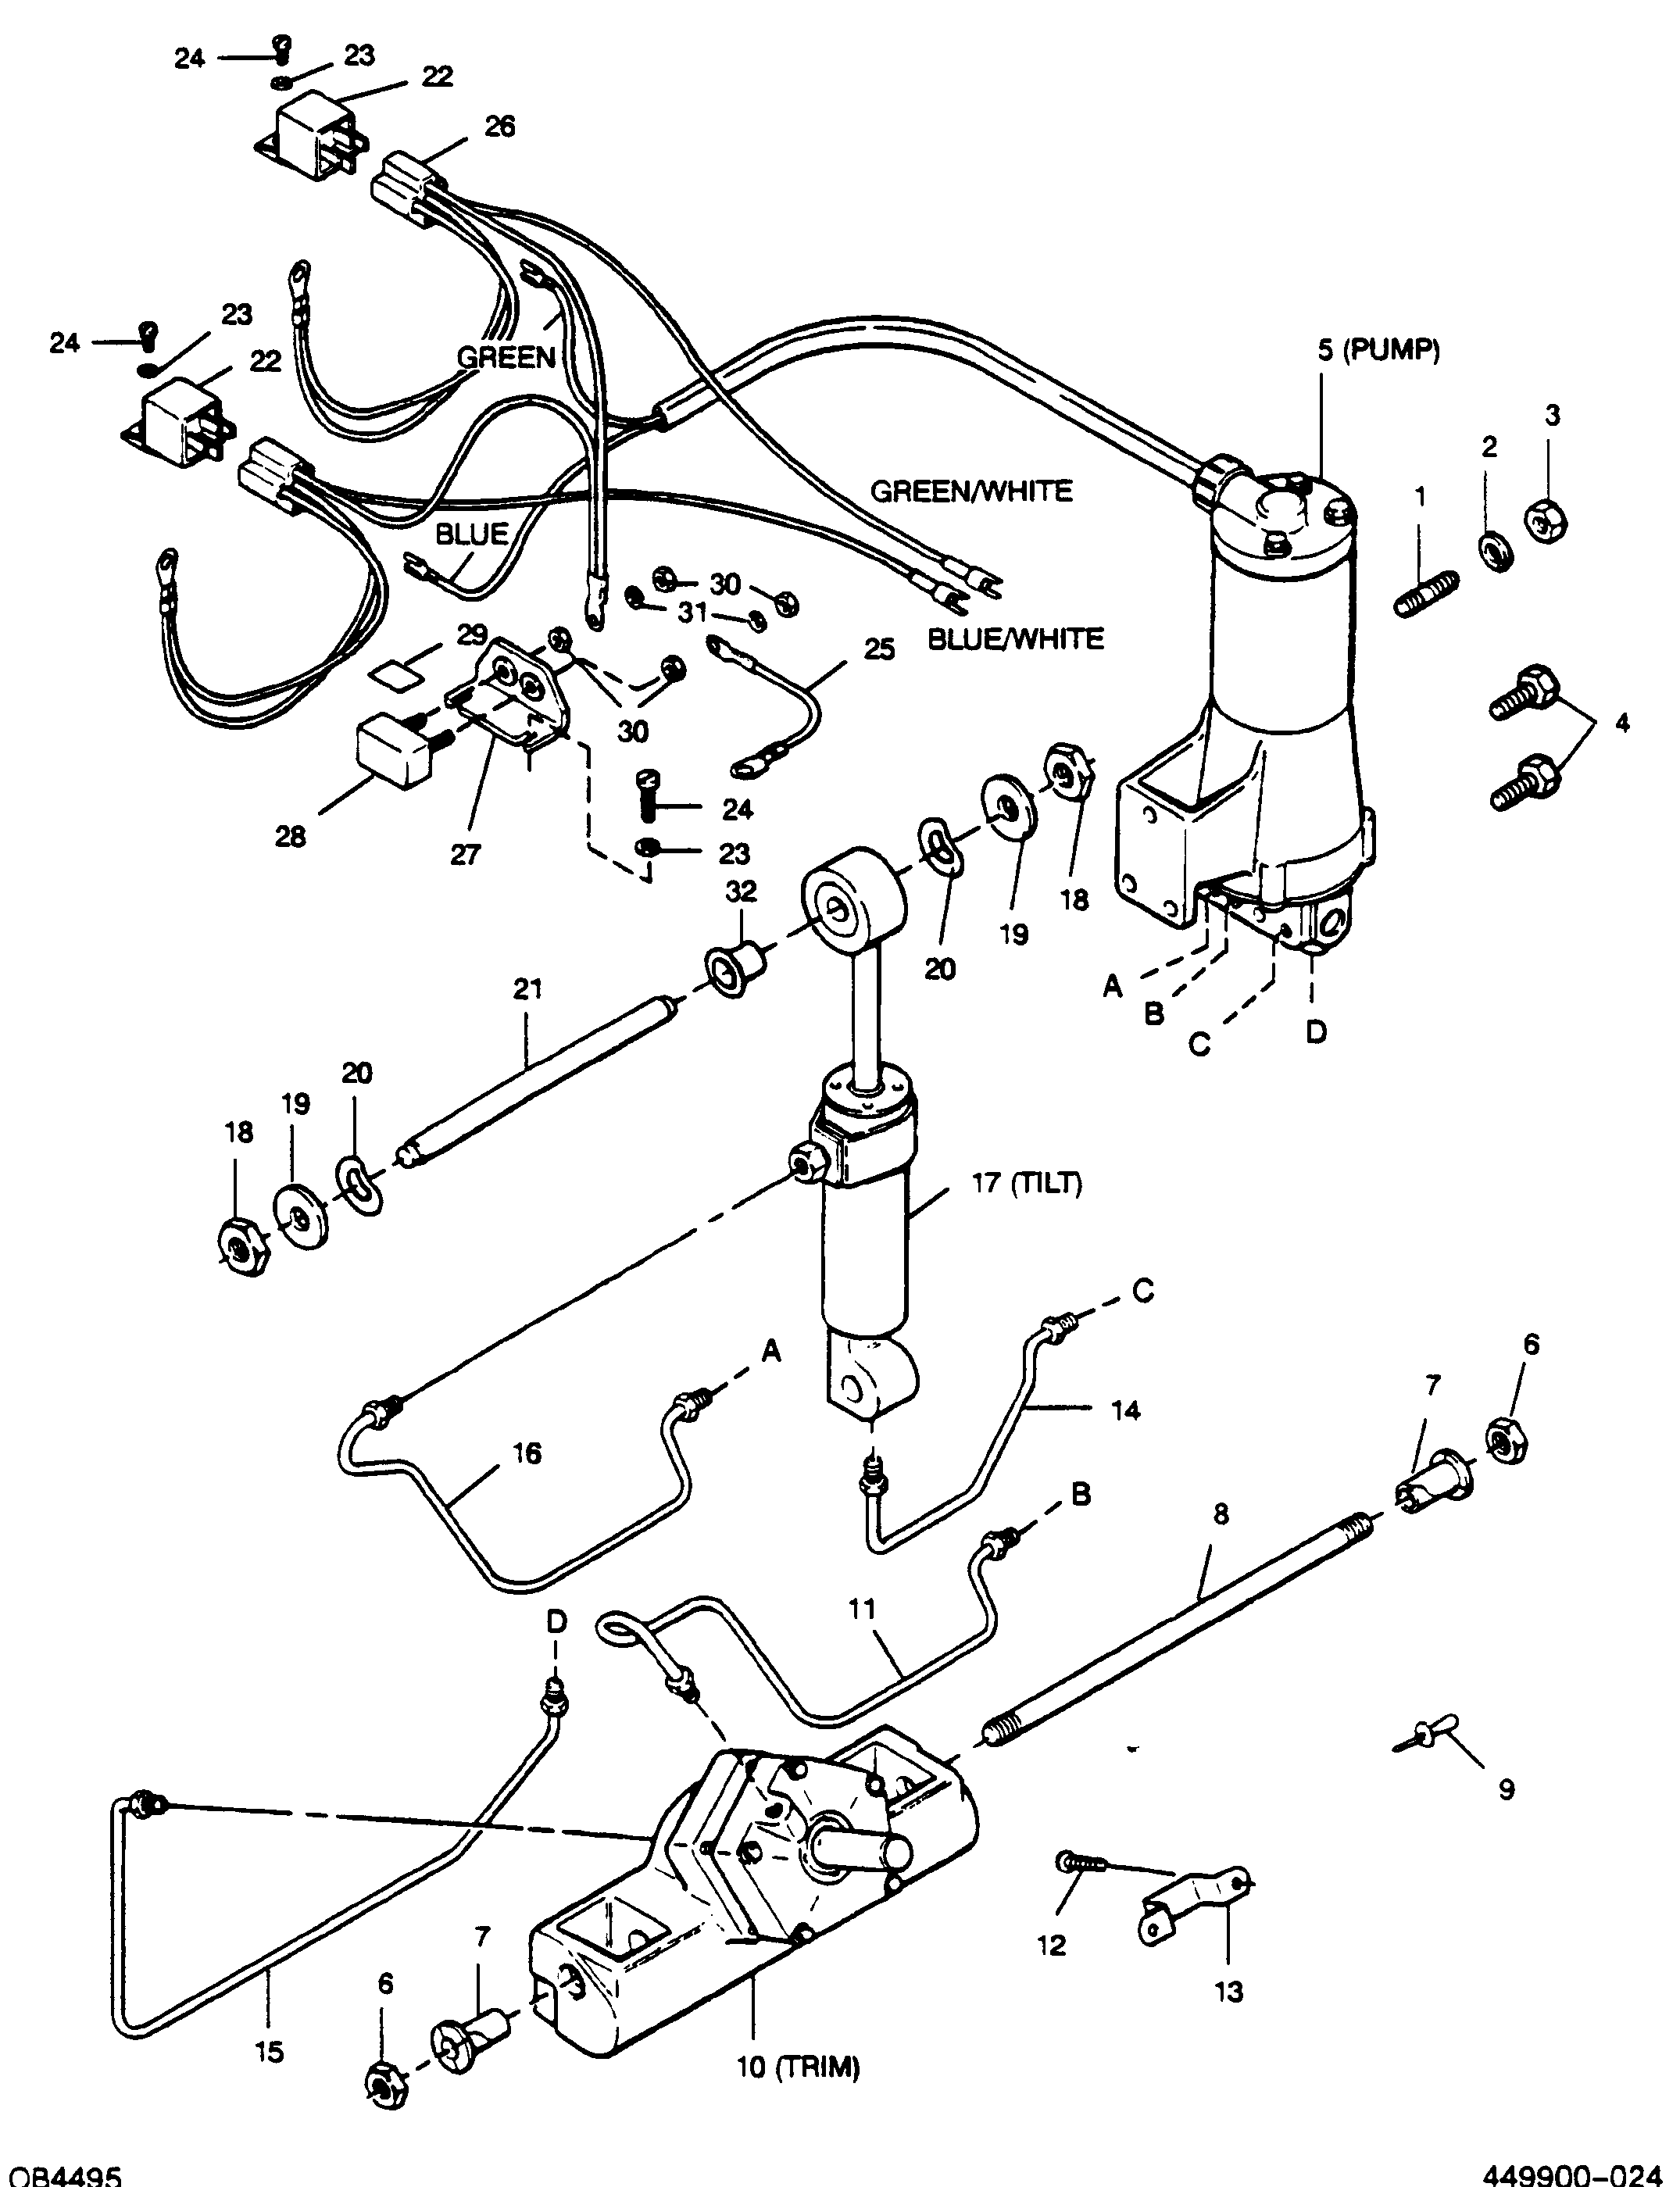 Mercury Marine 115 Hp 4 Cyl Gear Housing Driveshaft Parts Manual Guide